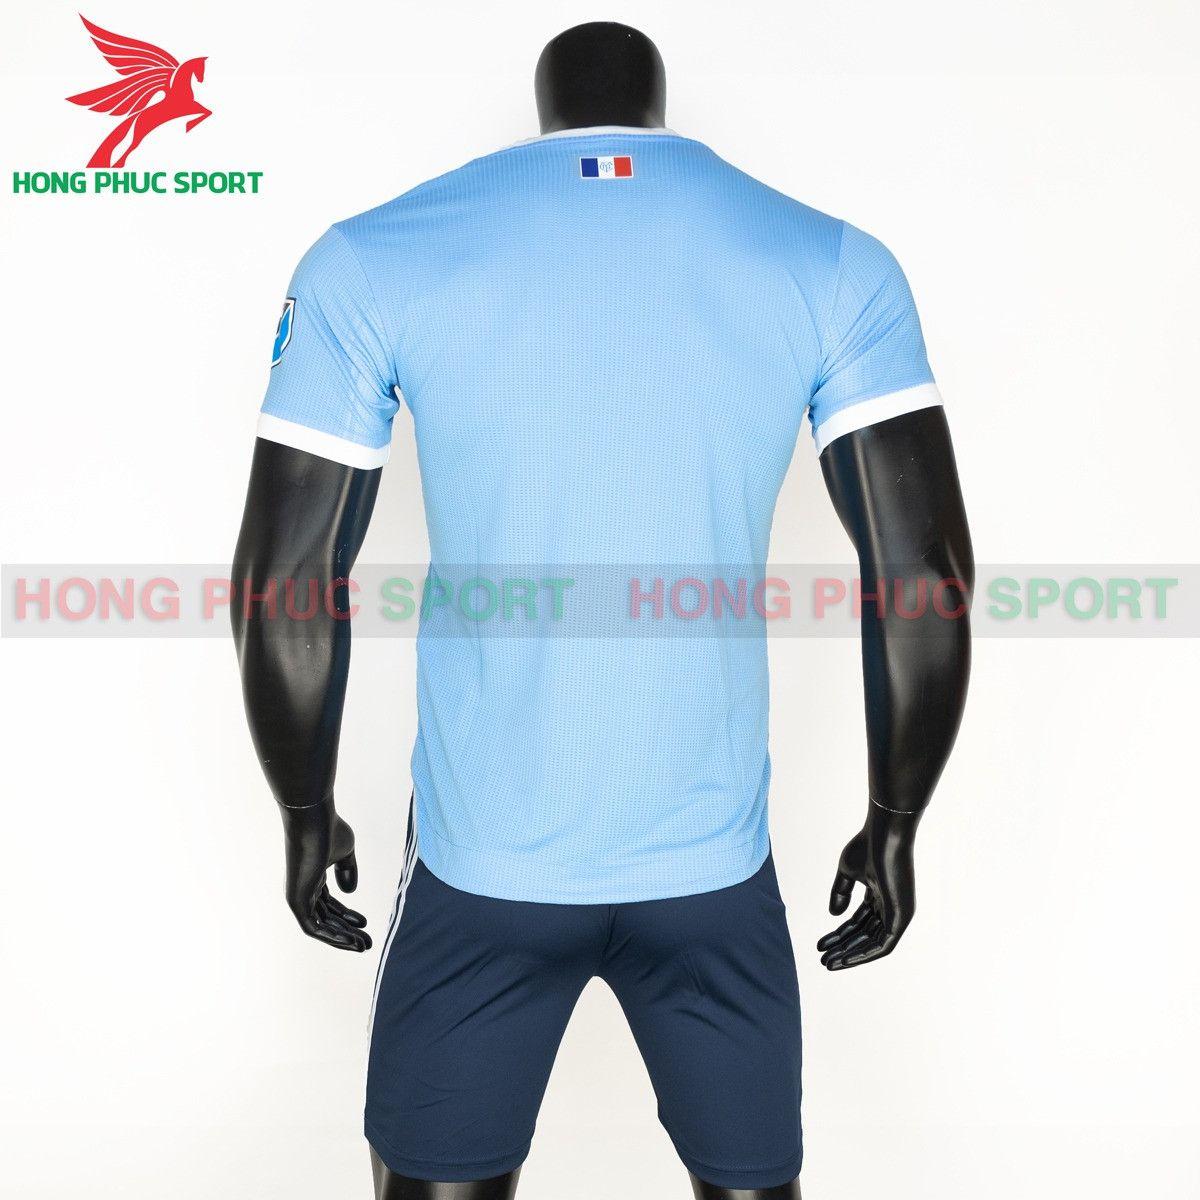 https://cdn.hongphucsport.com/unsafe/s4.shopbay.vn/files/285/ao-dau-new-york-city-2021-2022-san-nha-thailand-6-614add2c66b6e.jpg